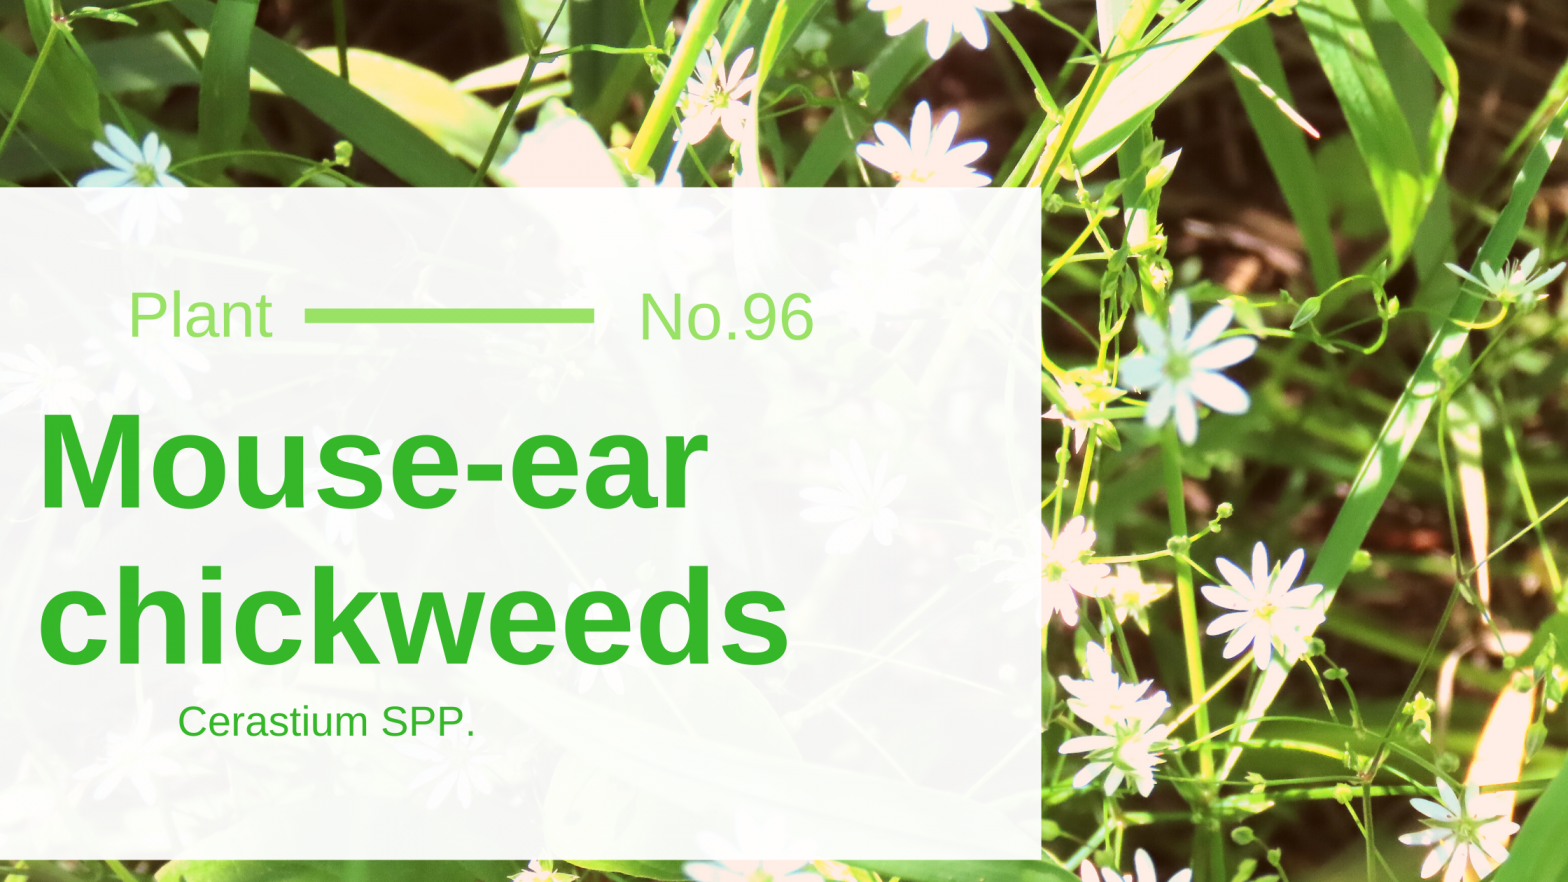 Mouse-ear Chickweeds - Cerastium SPP.